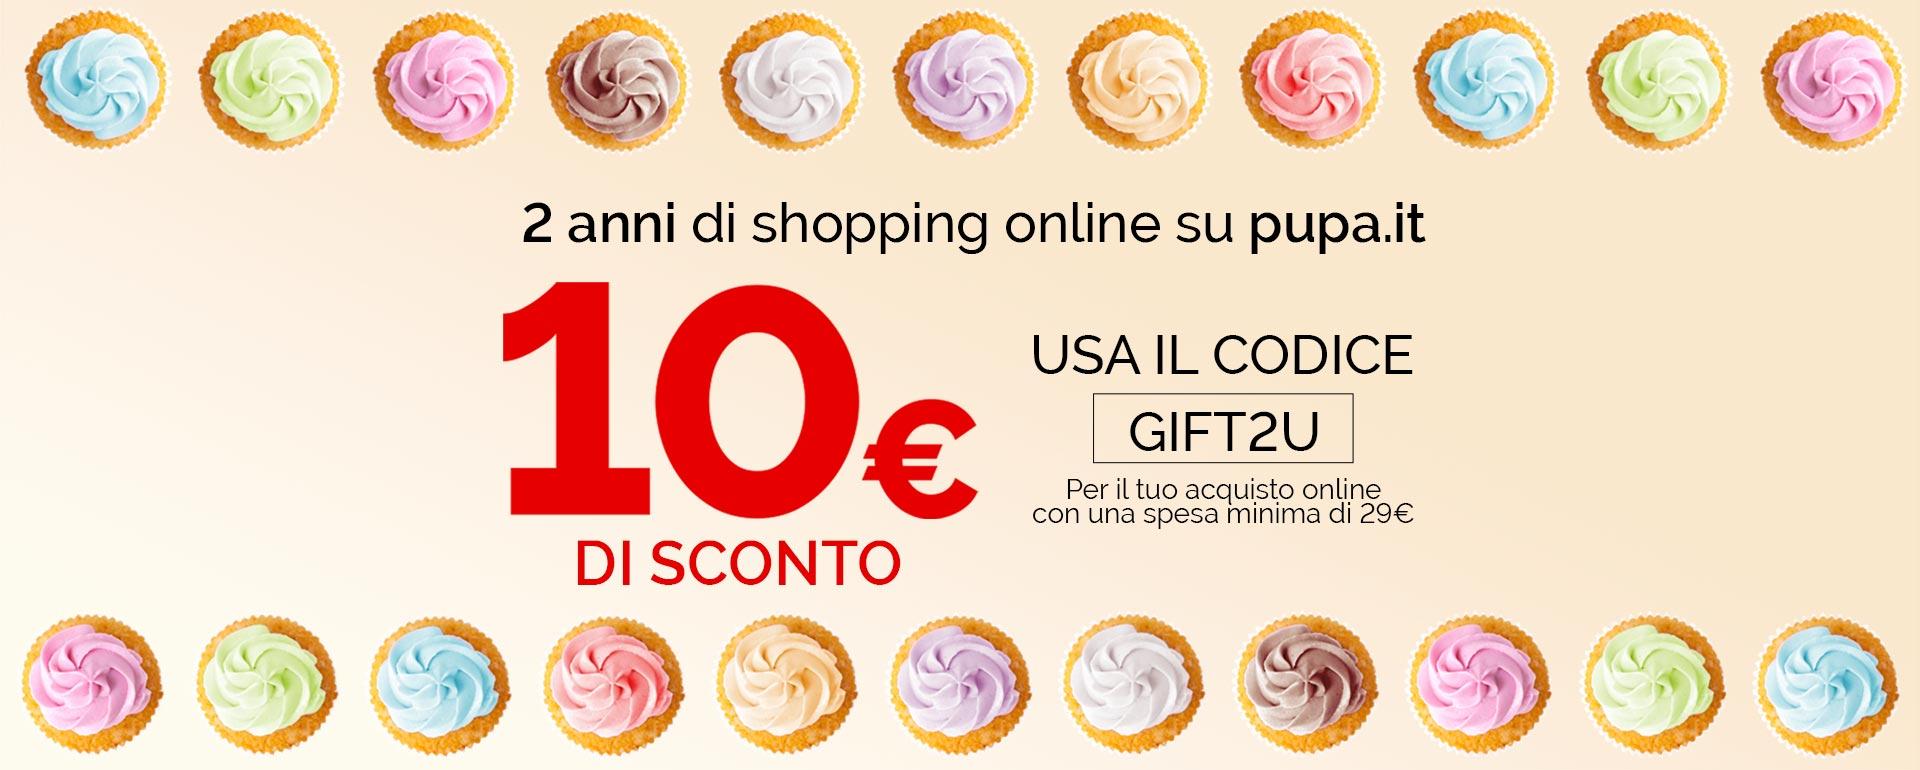 2 anni di shopping online - PUPA Milano